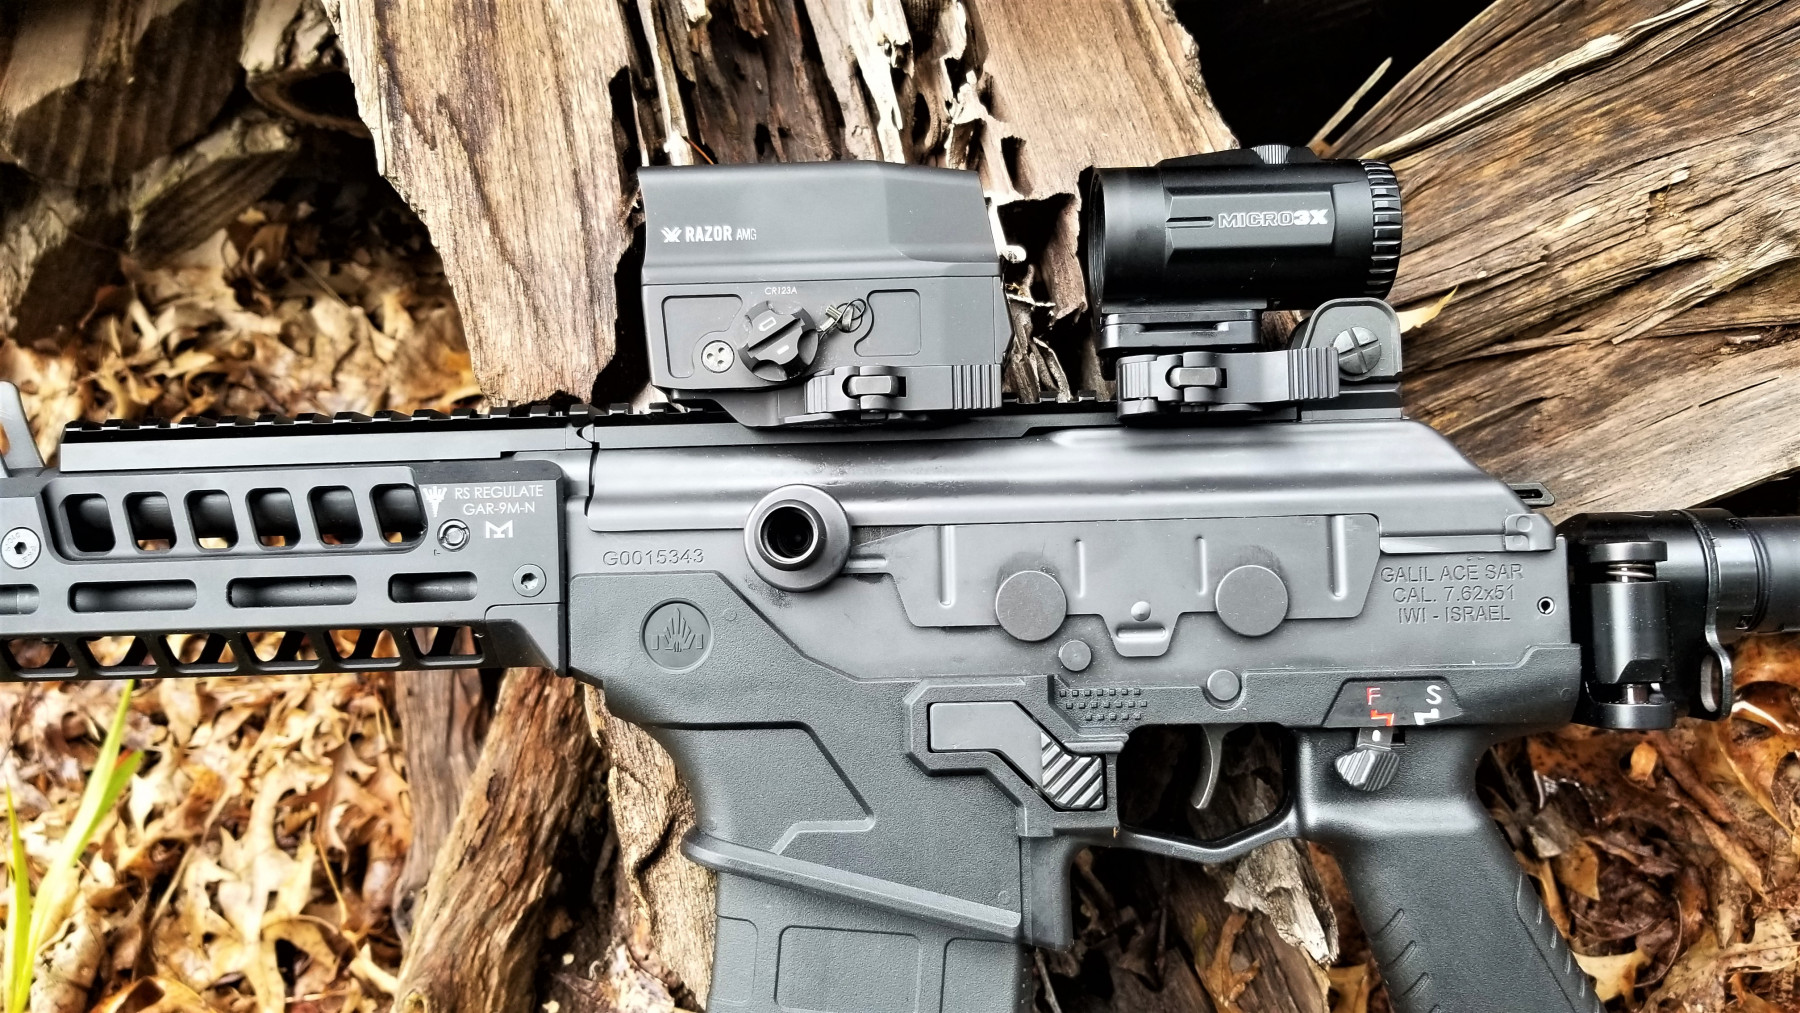 "Vortex Optics Razor AMG UH-1 ""Huey"" holographic sight and Micro 3X magnifier"